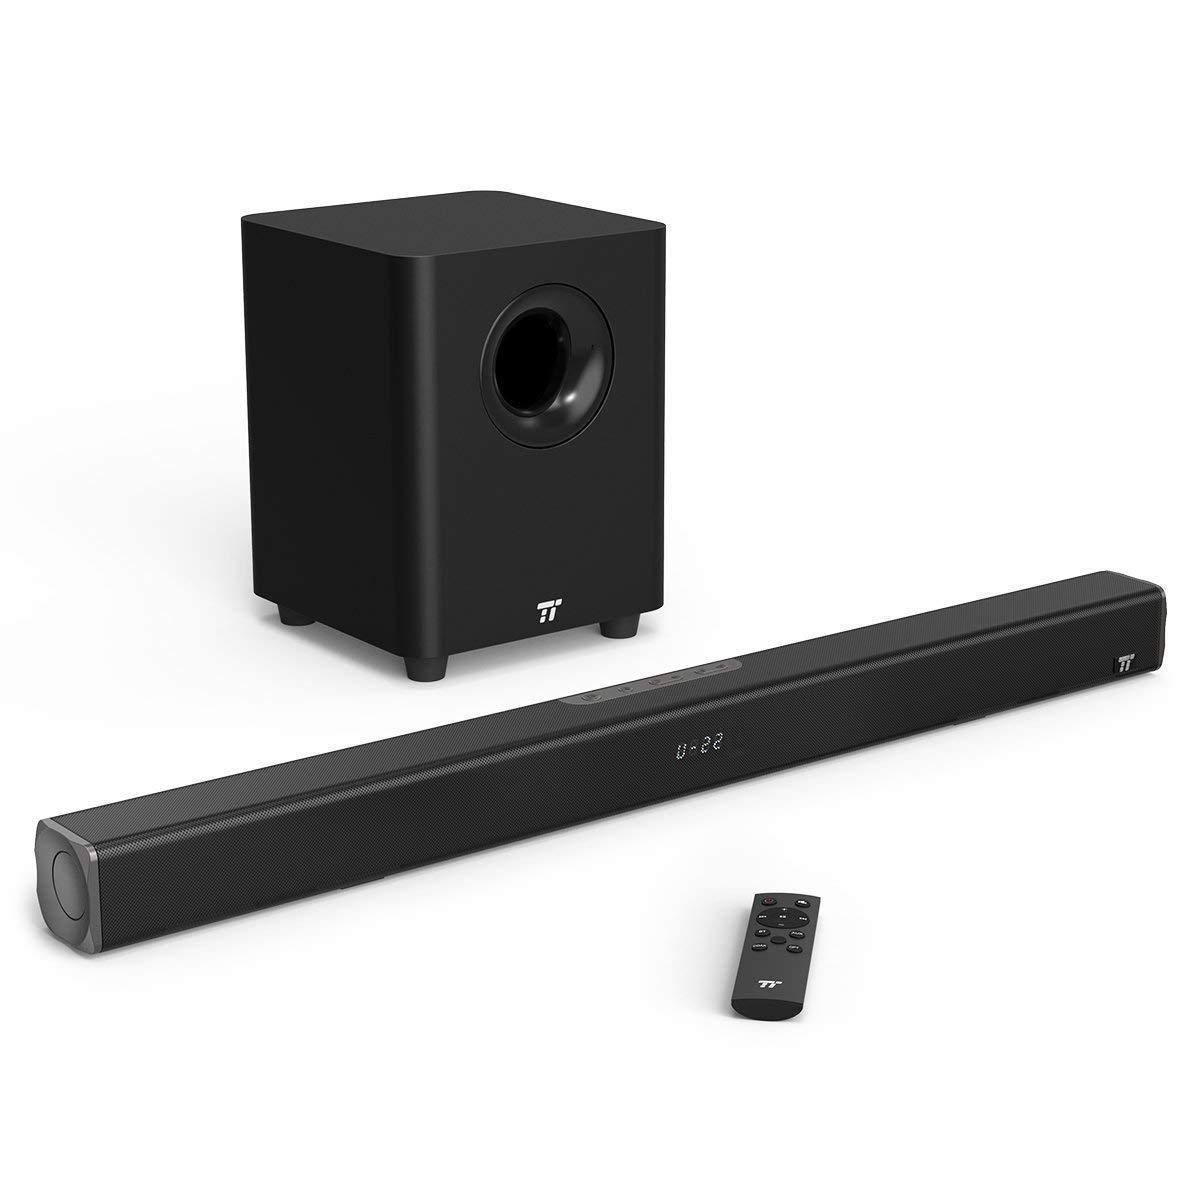 TaoTronics TV Soundbar 2.1 z brezžičnim nizkotoncem 120W črn TT-SK20